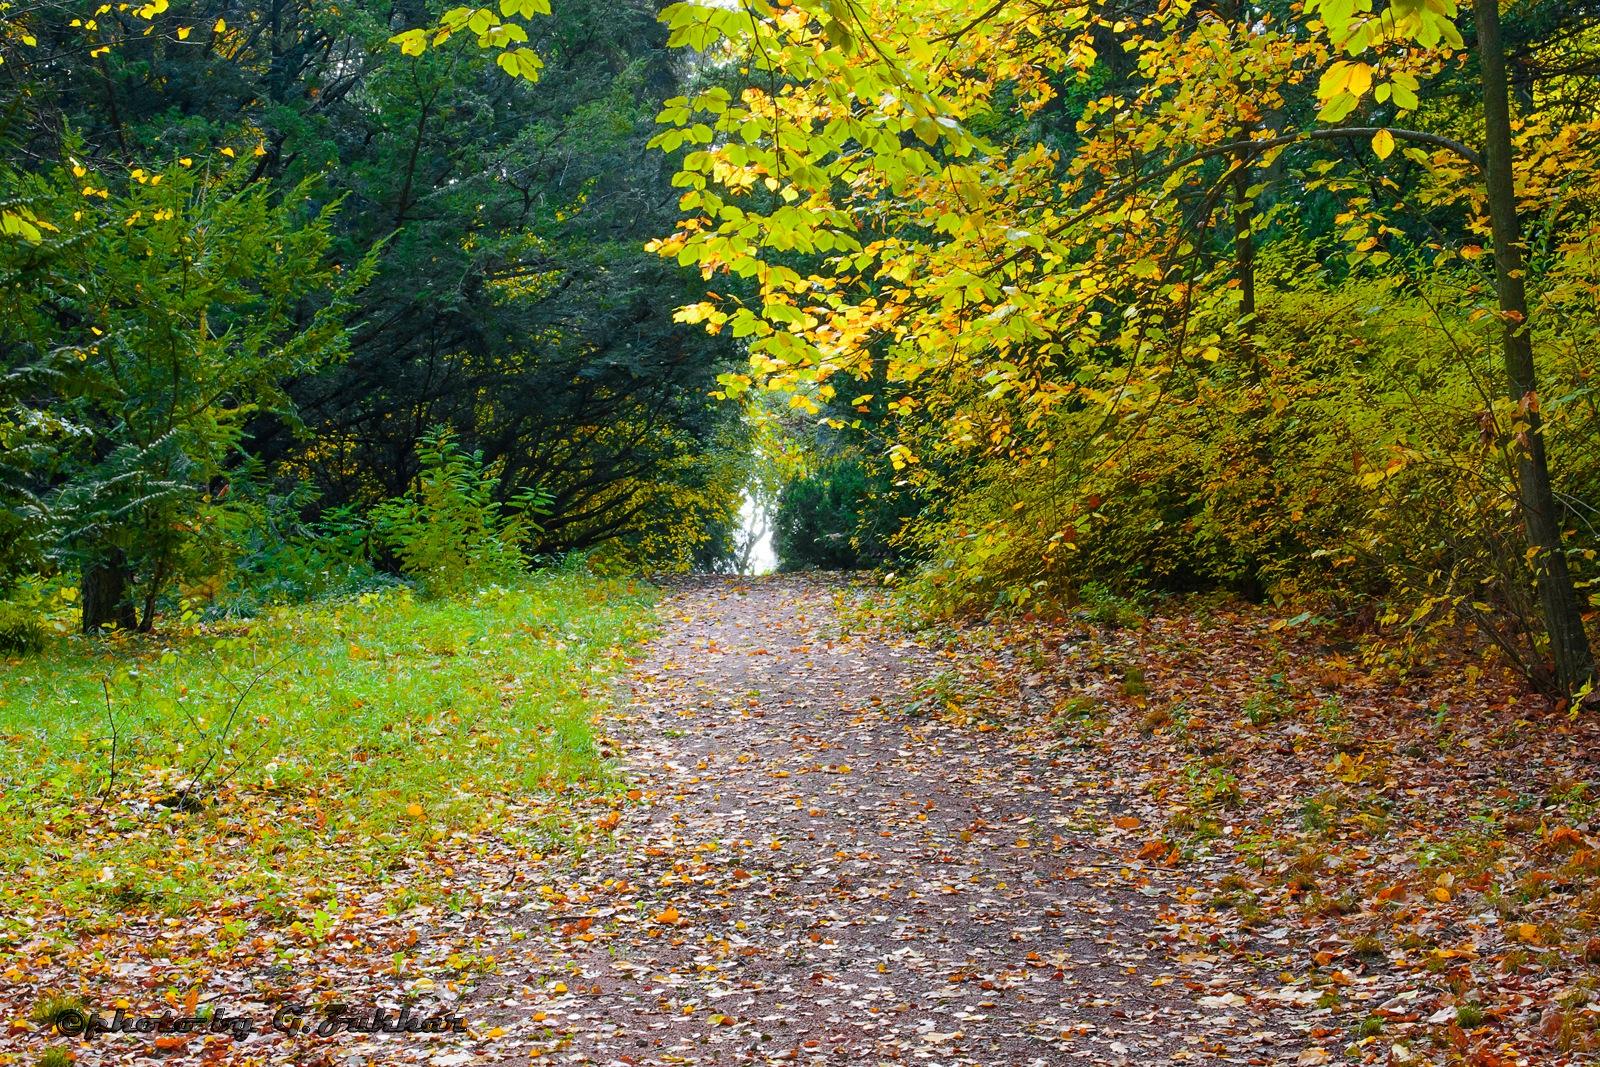 Colours of Autumn by Georgii Zukhar